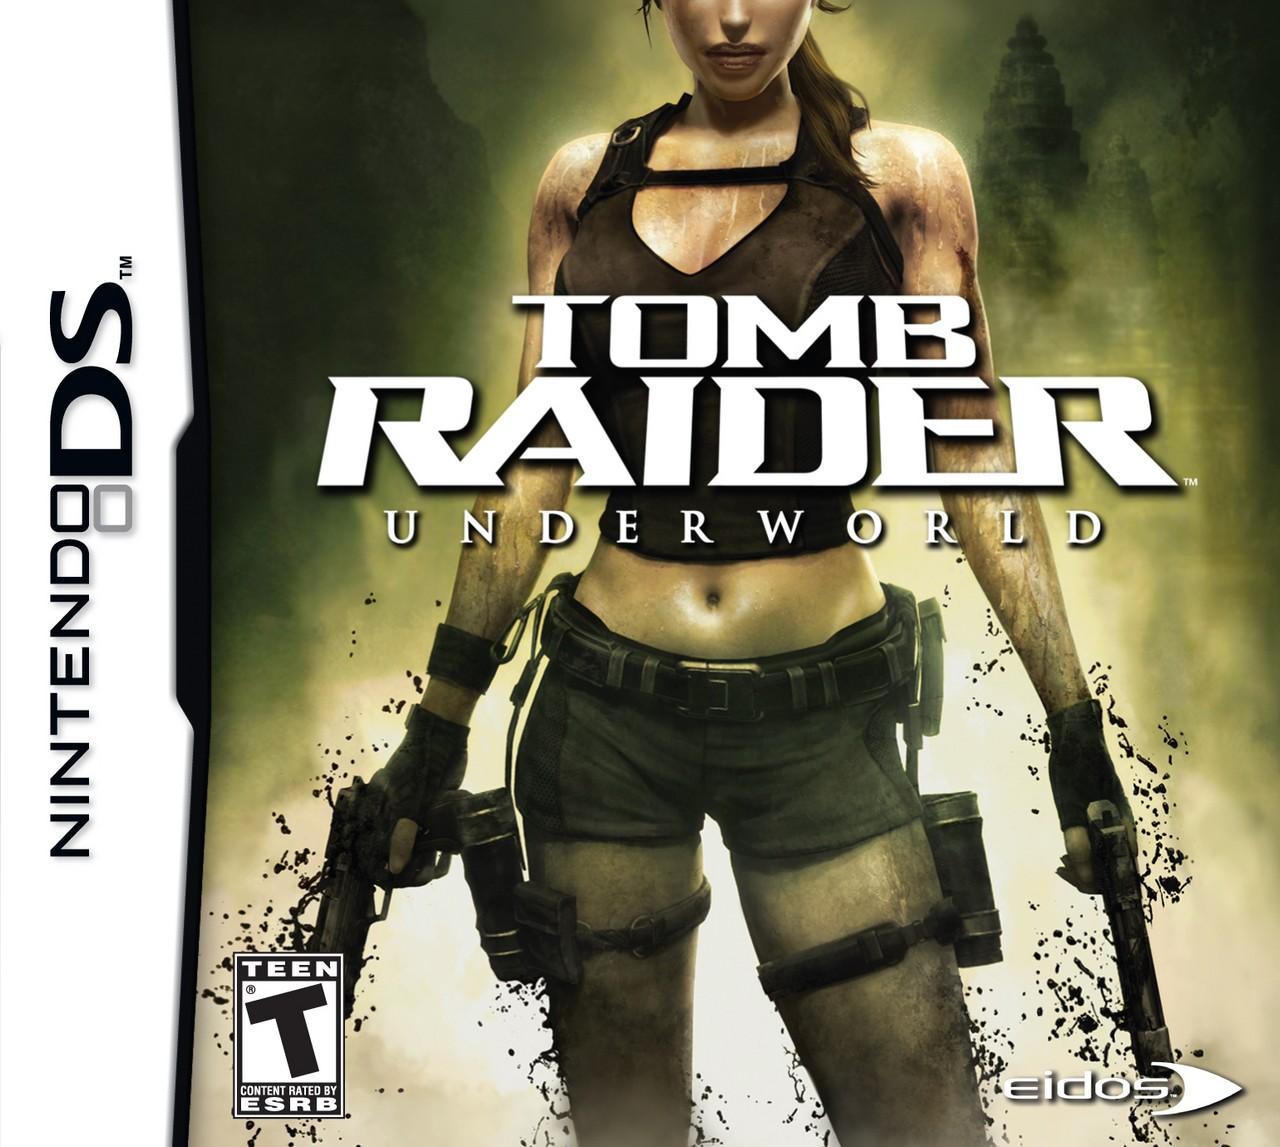 Tomb Raider Game: Tomb Raider Underworld DS Game